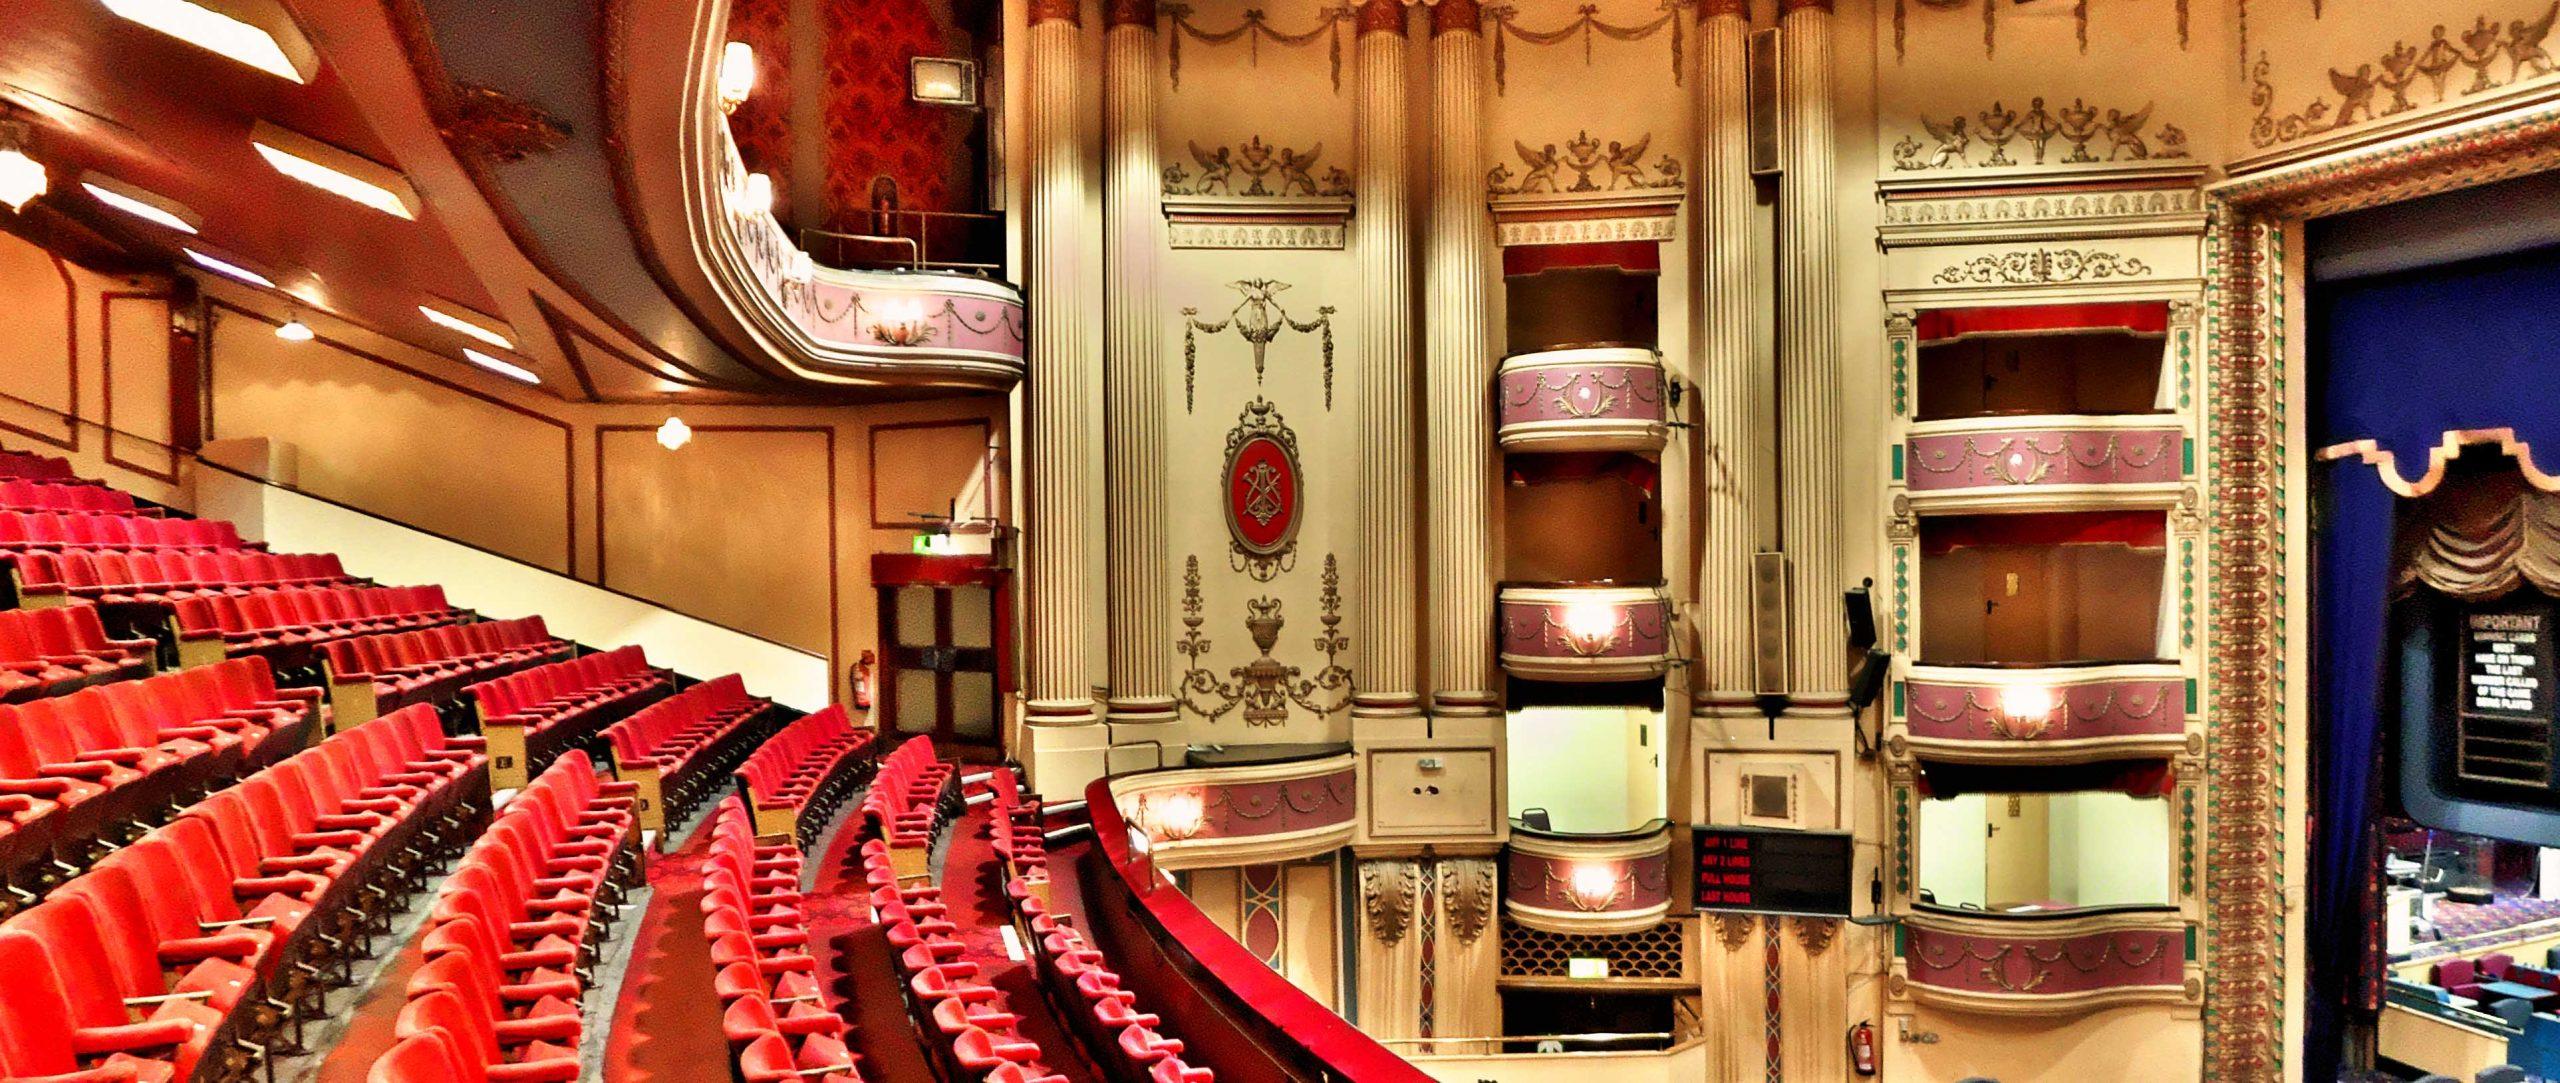 Inside Streatham Theatre